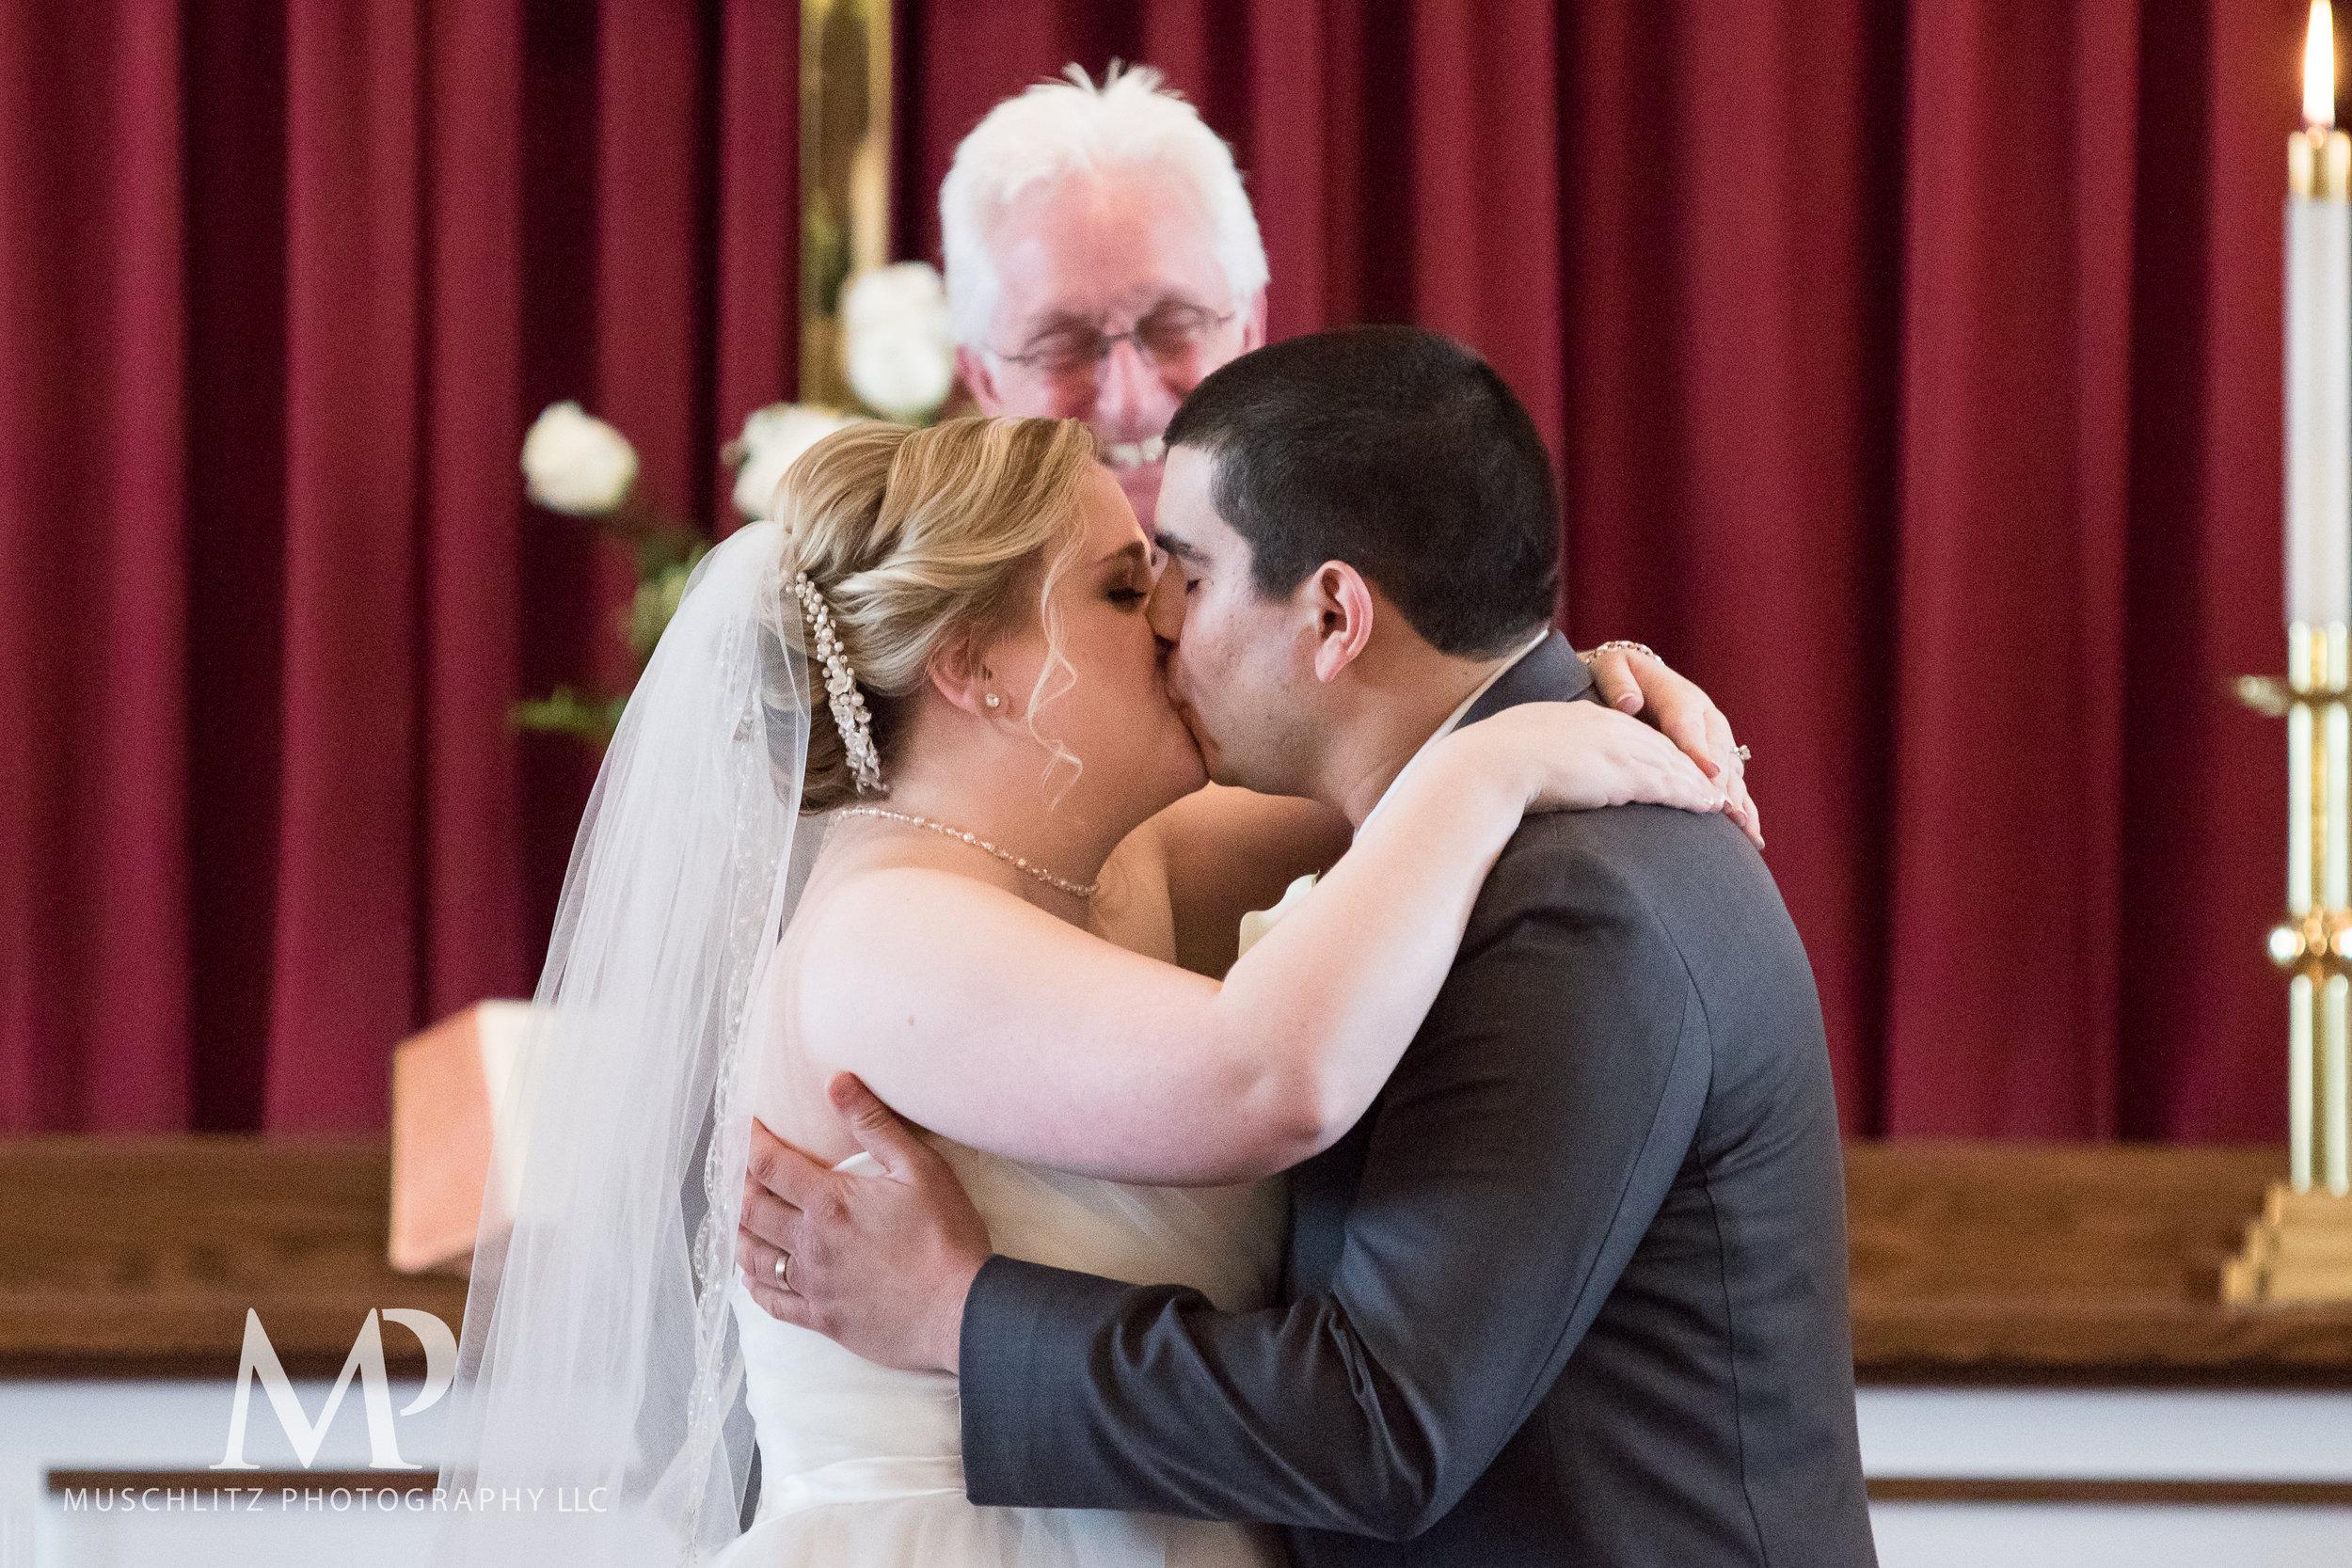 dublin-community-church-wedding-columbus-ohio-muschlitz-photography-057.JPG